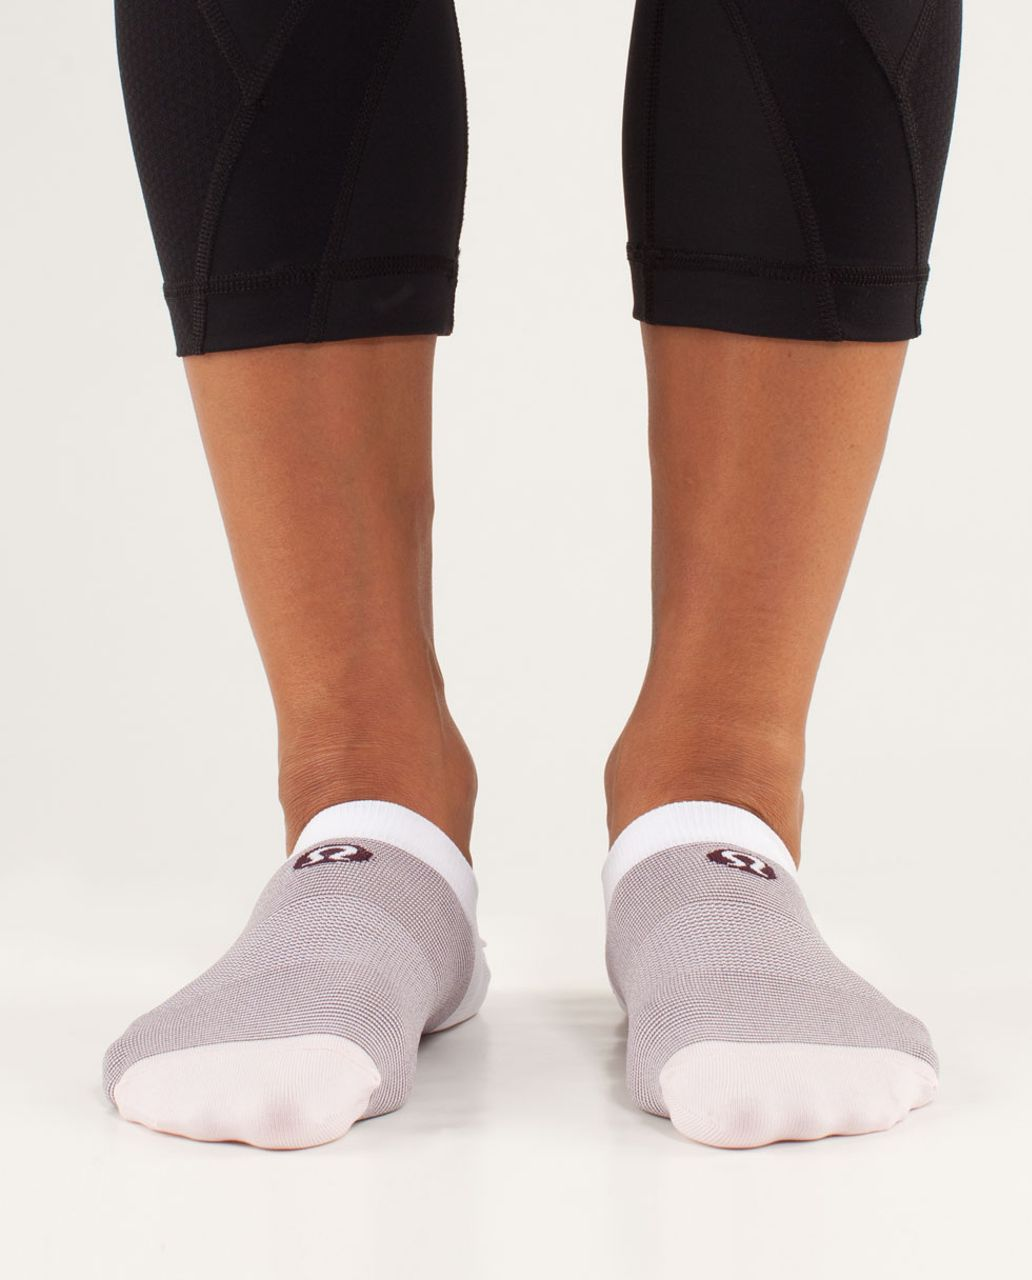 Lululemon Women's Featherweight Sock - Feeder Stripe Pretty Pink / Bordeaux Drama / White